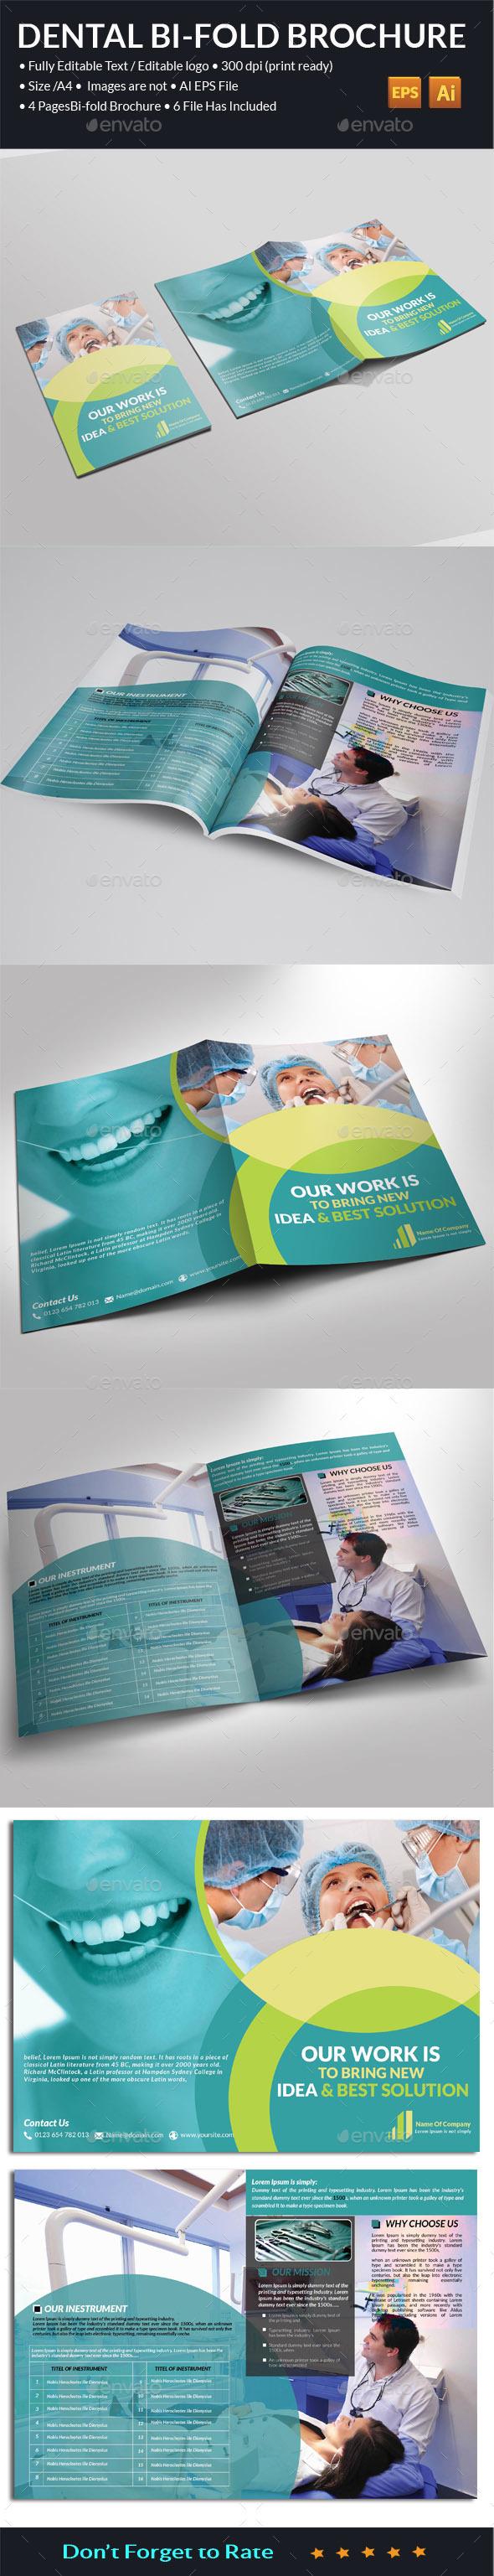 Dental Bi-Fold Brochure   - Brochures Print Templates